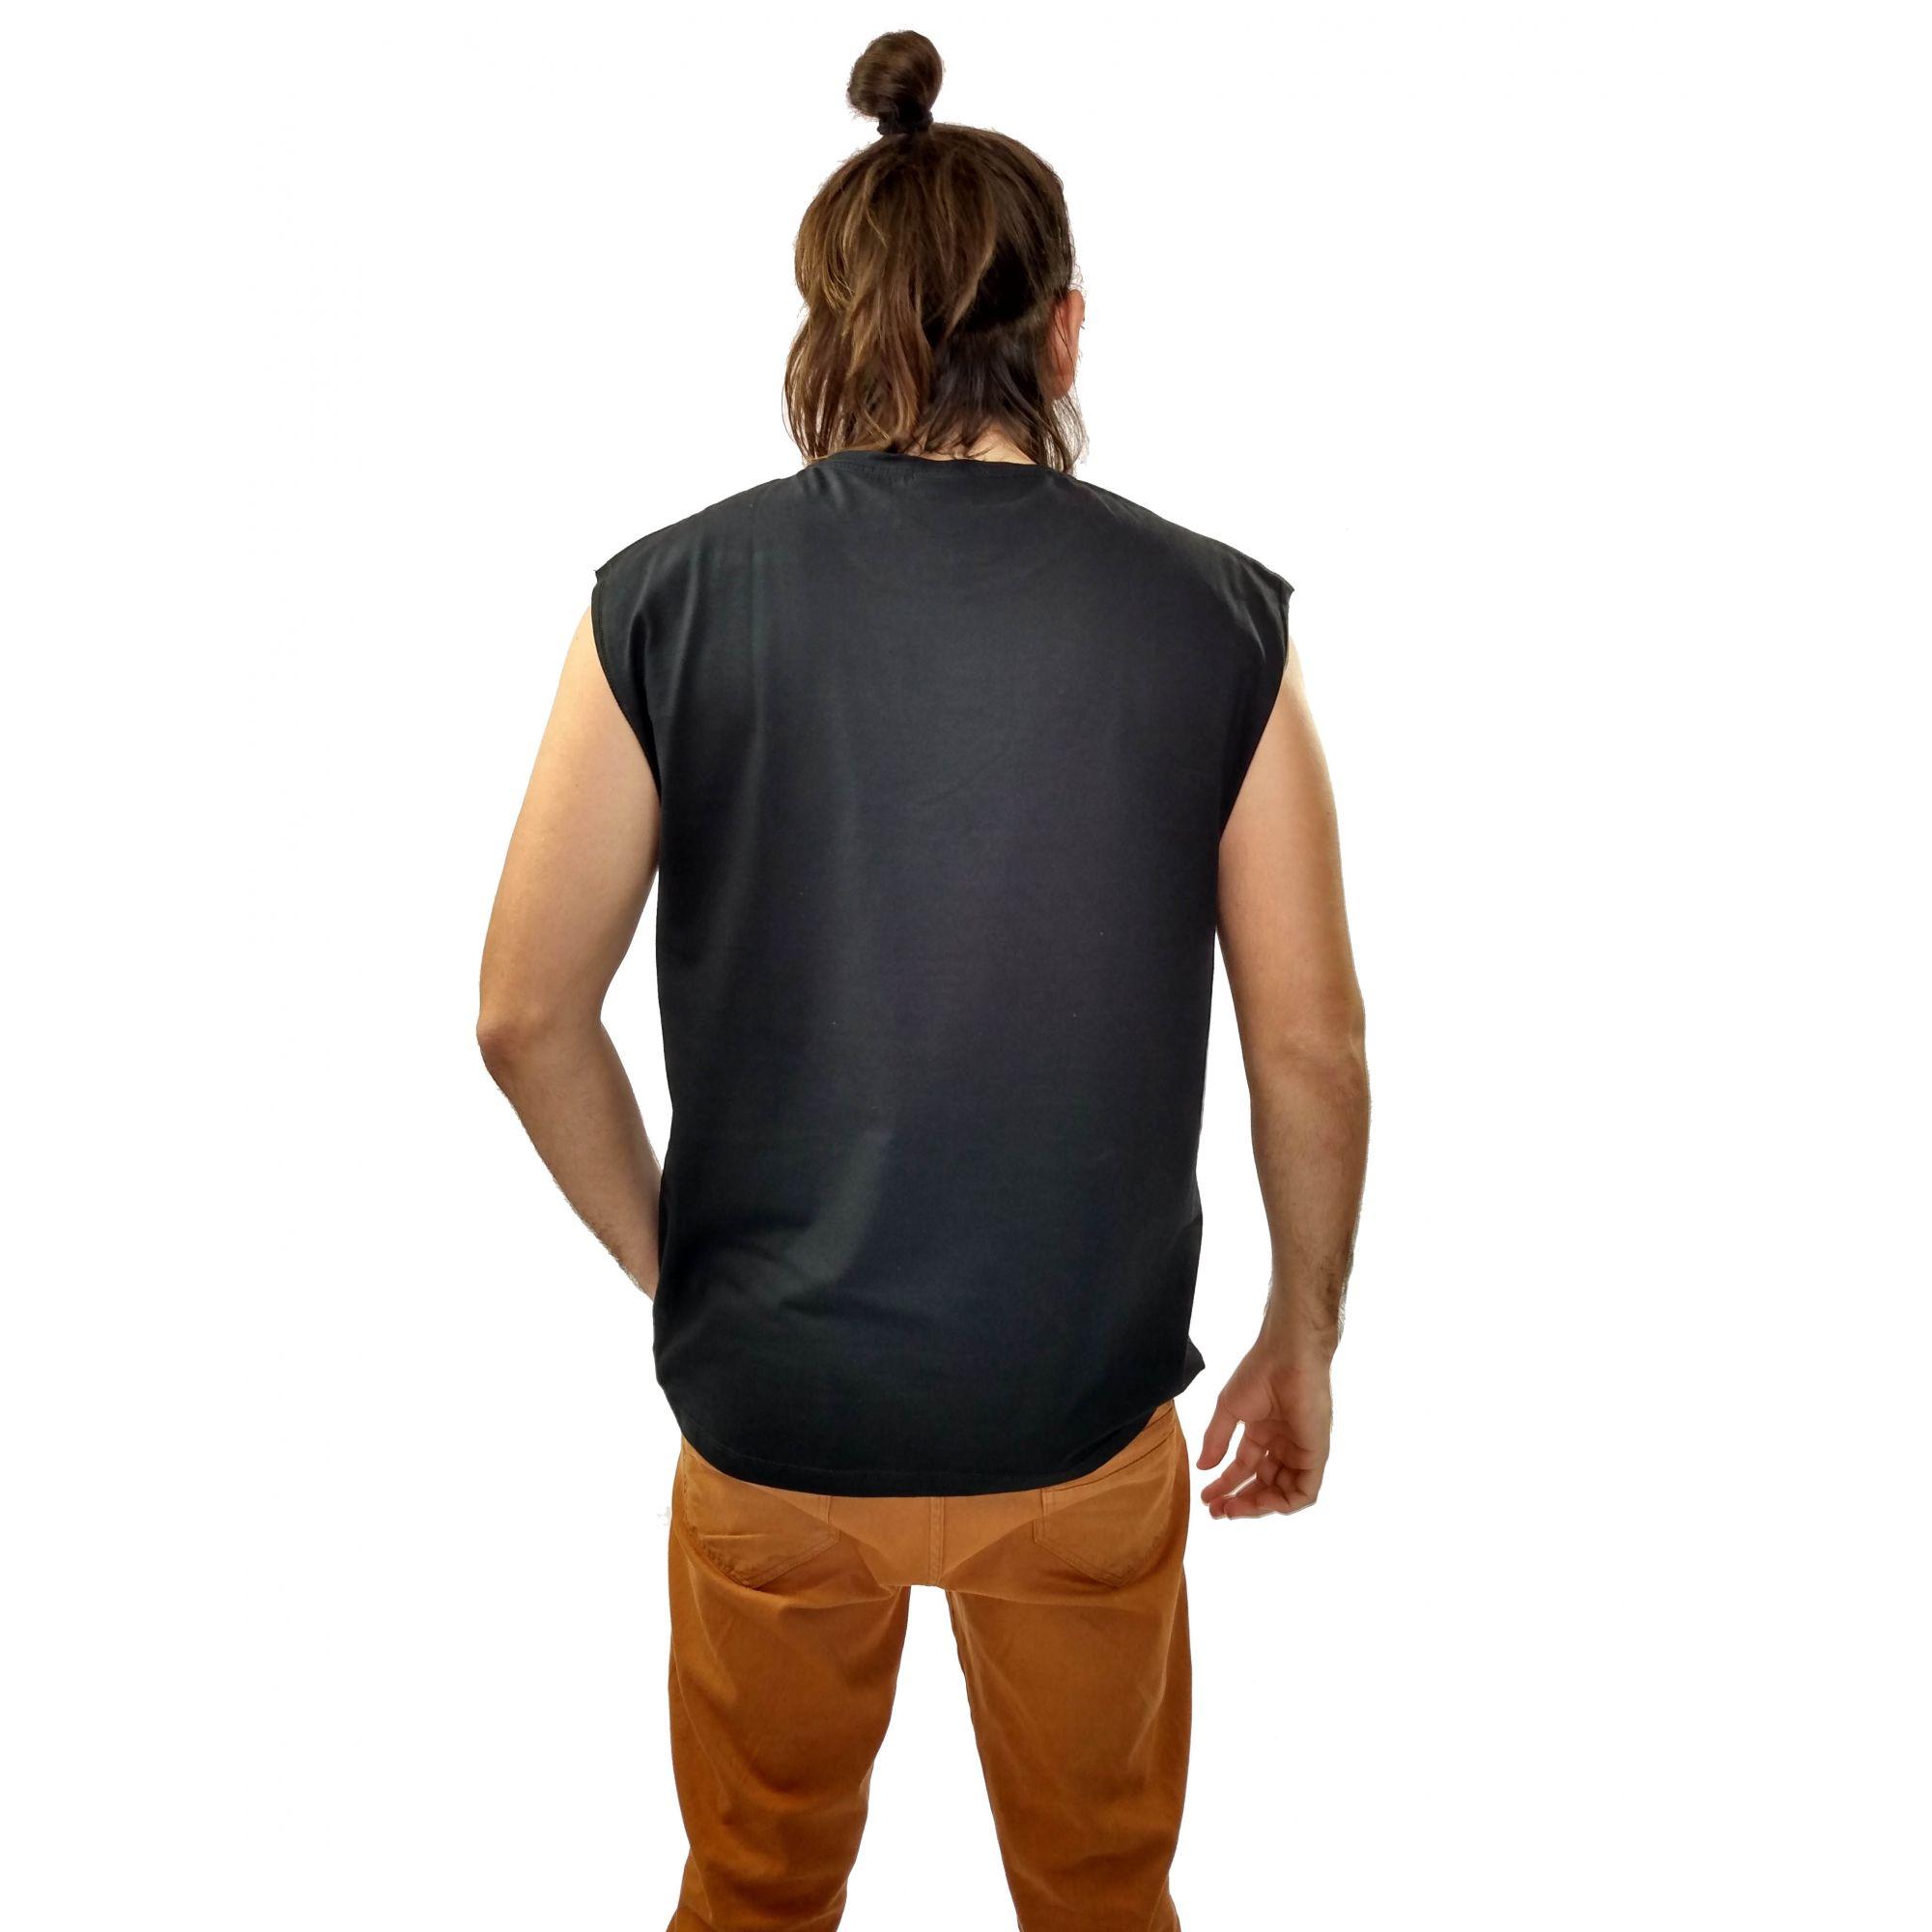 Camiseta Cavalera Masculina Regata Águia Dupla Face